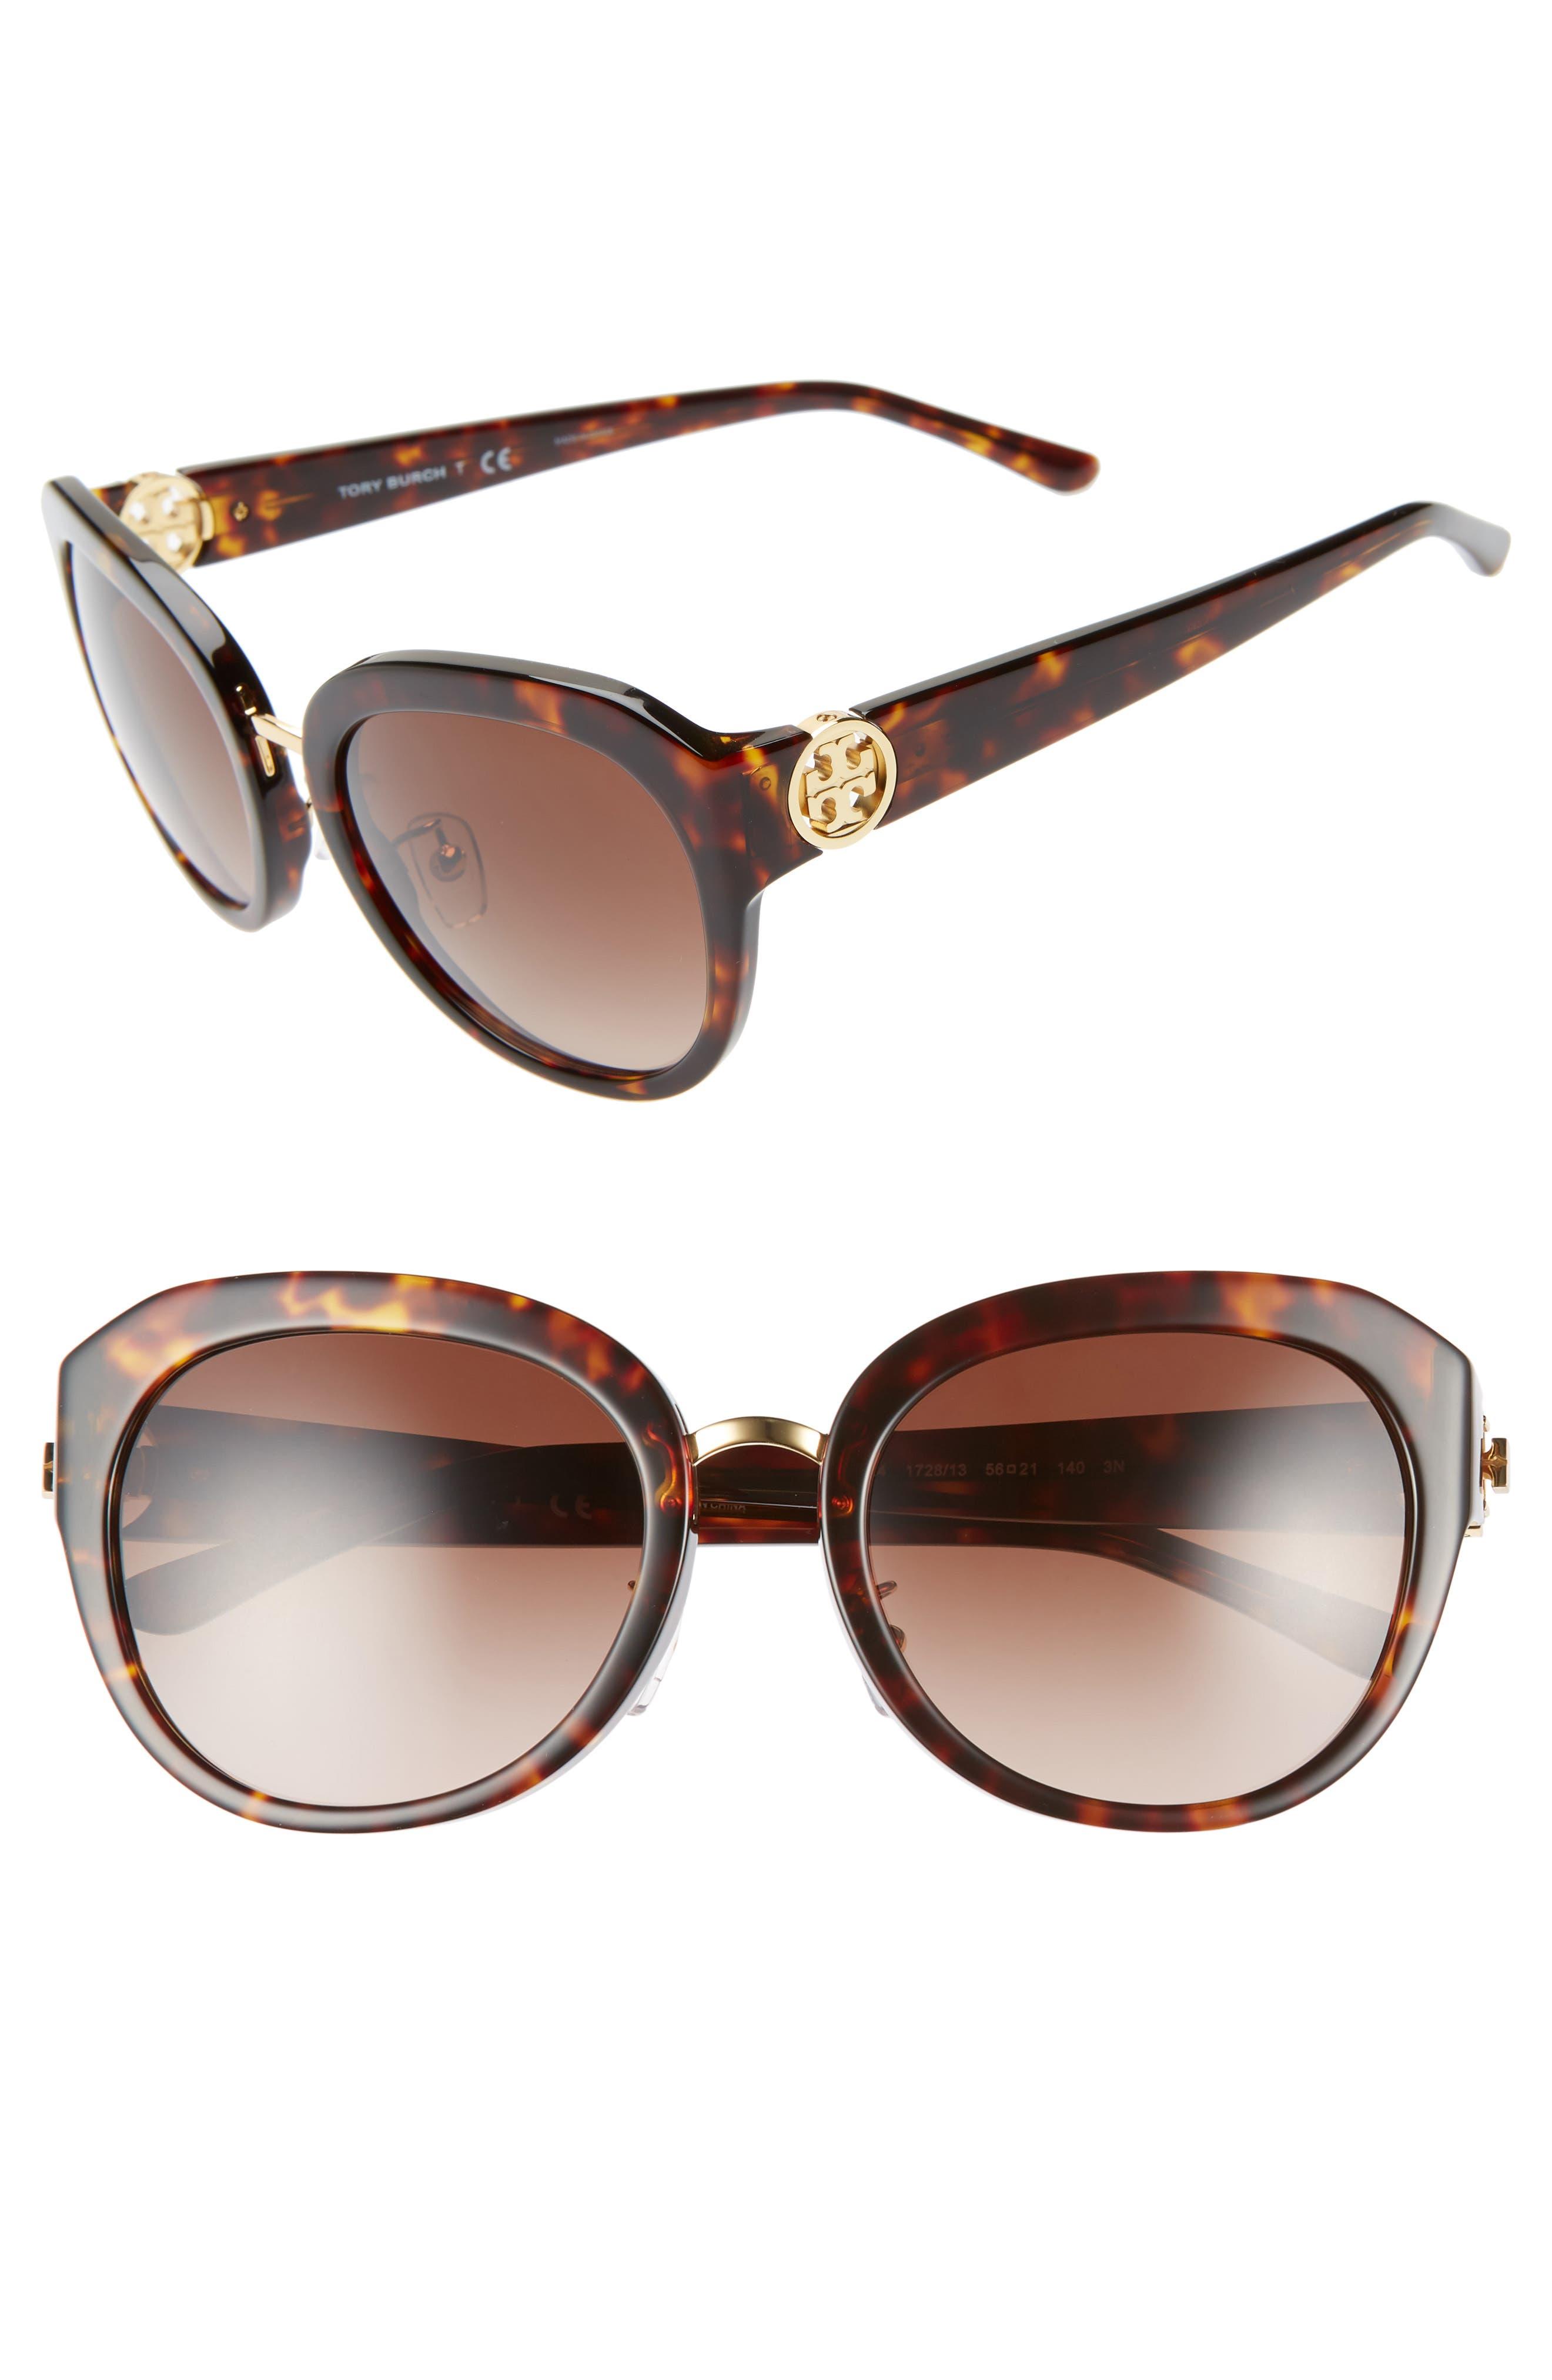 Irregular Reva 56mm Sunglasses,                             Main thumbnail 1, color,                             212